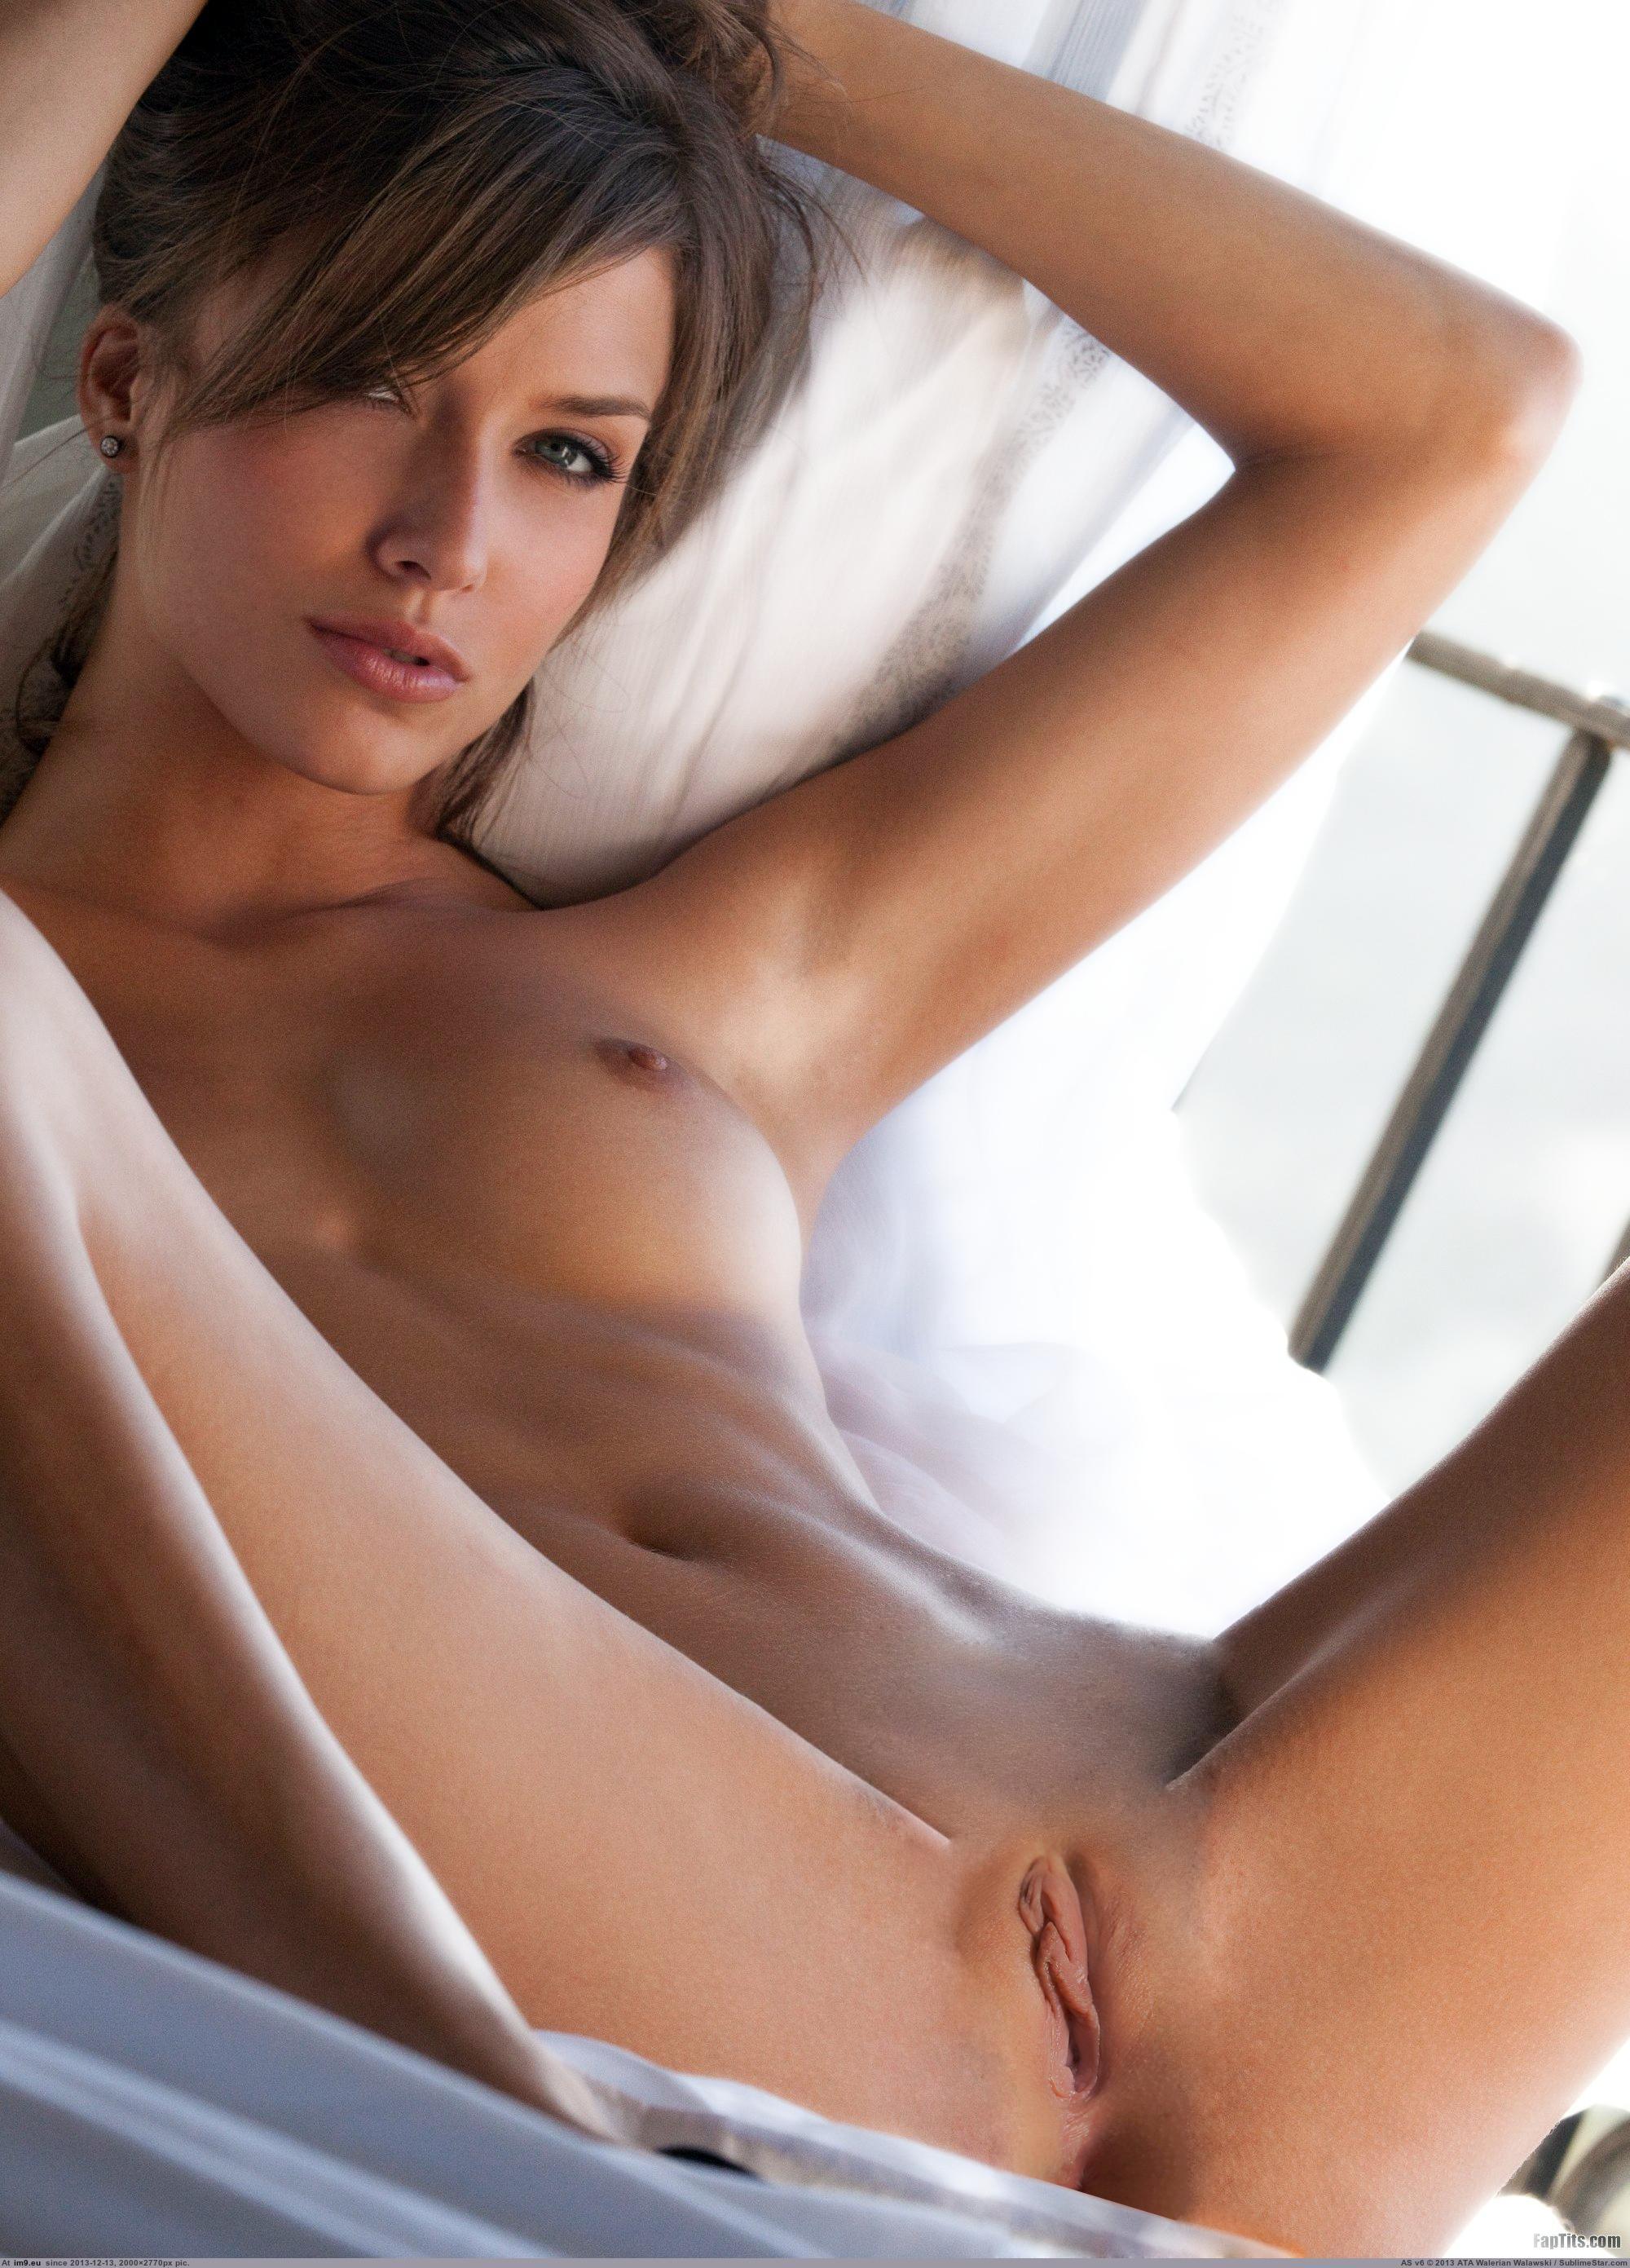 hot hs girls nude